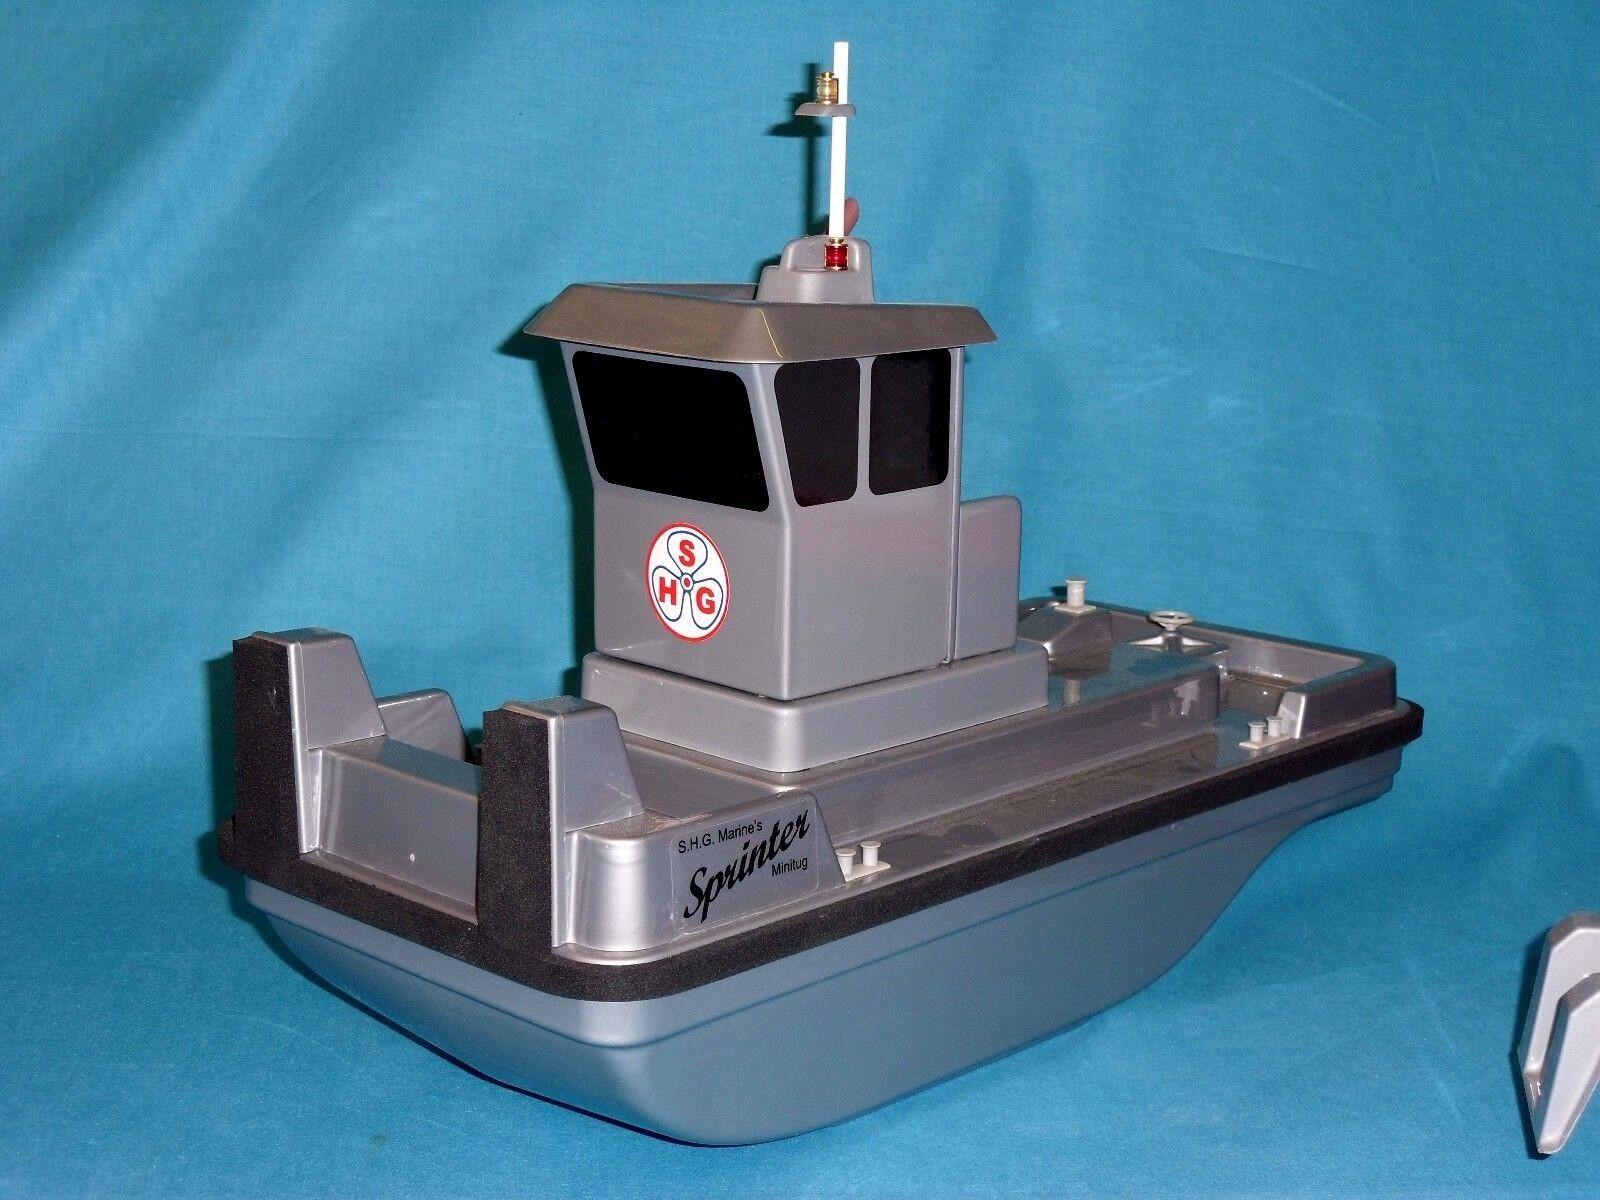 Sprinter Model Tugboat Kit by S.H.G. Marine